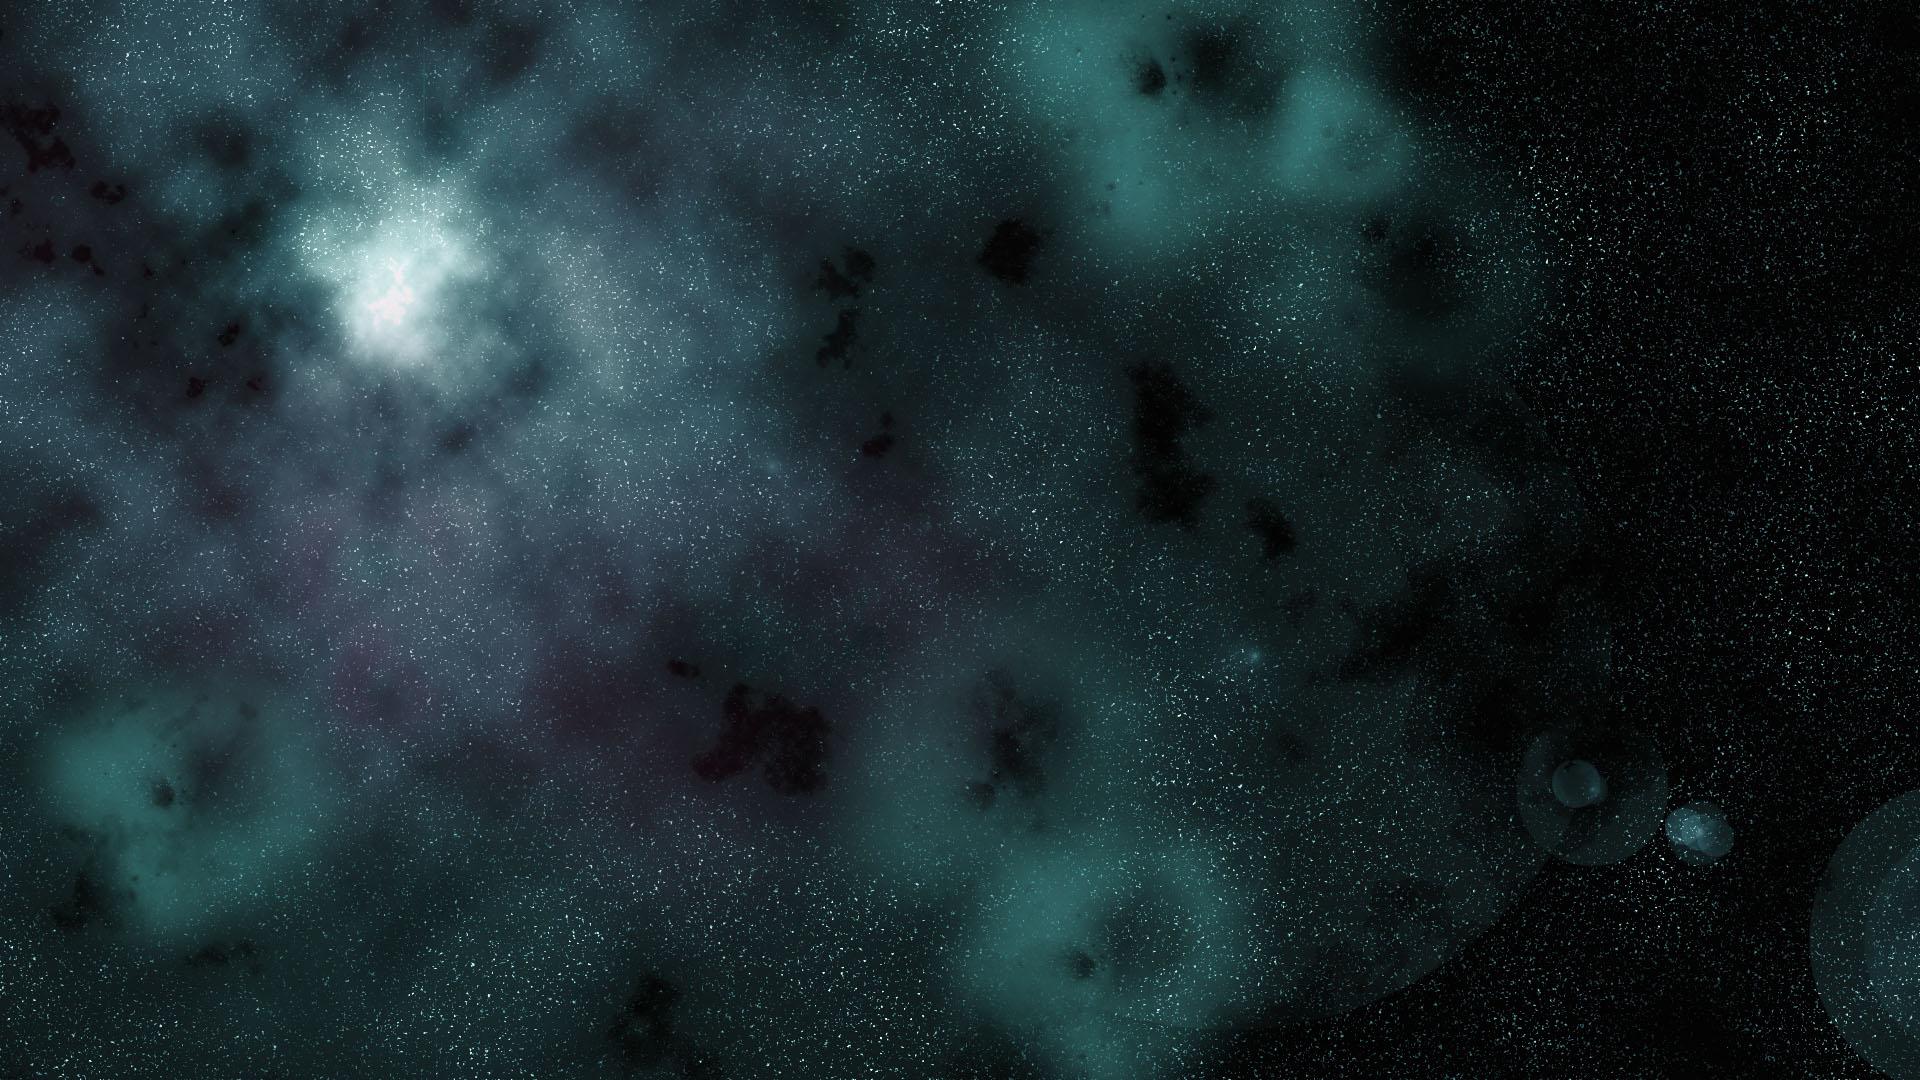 Create a nice galaxy background